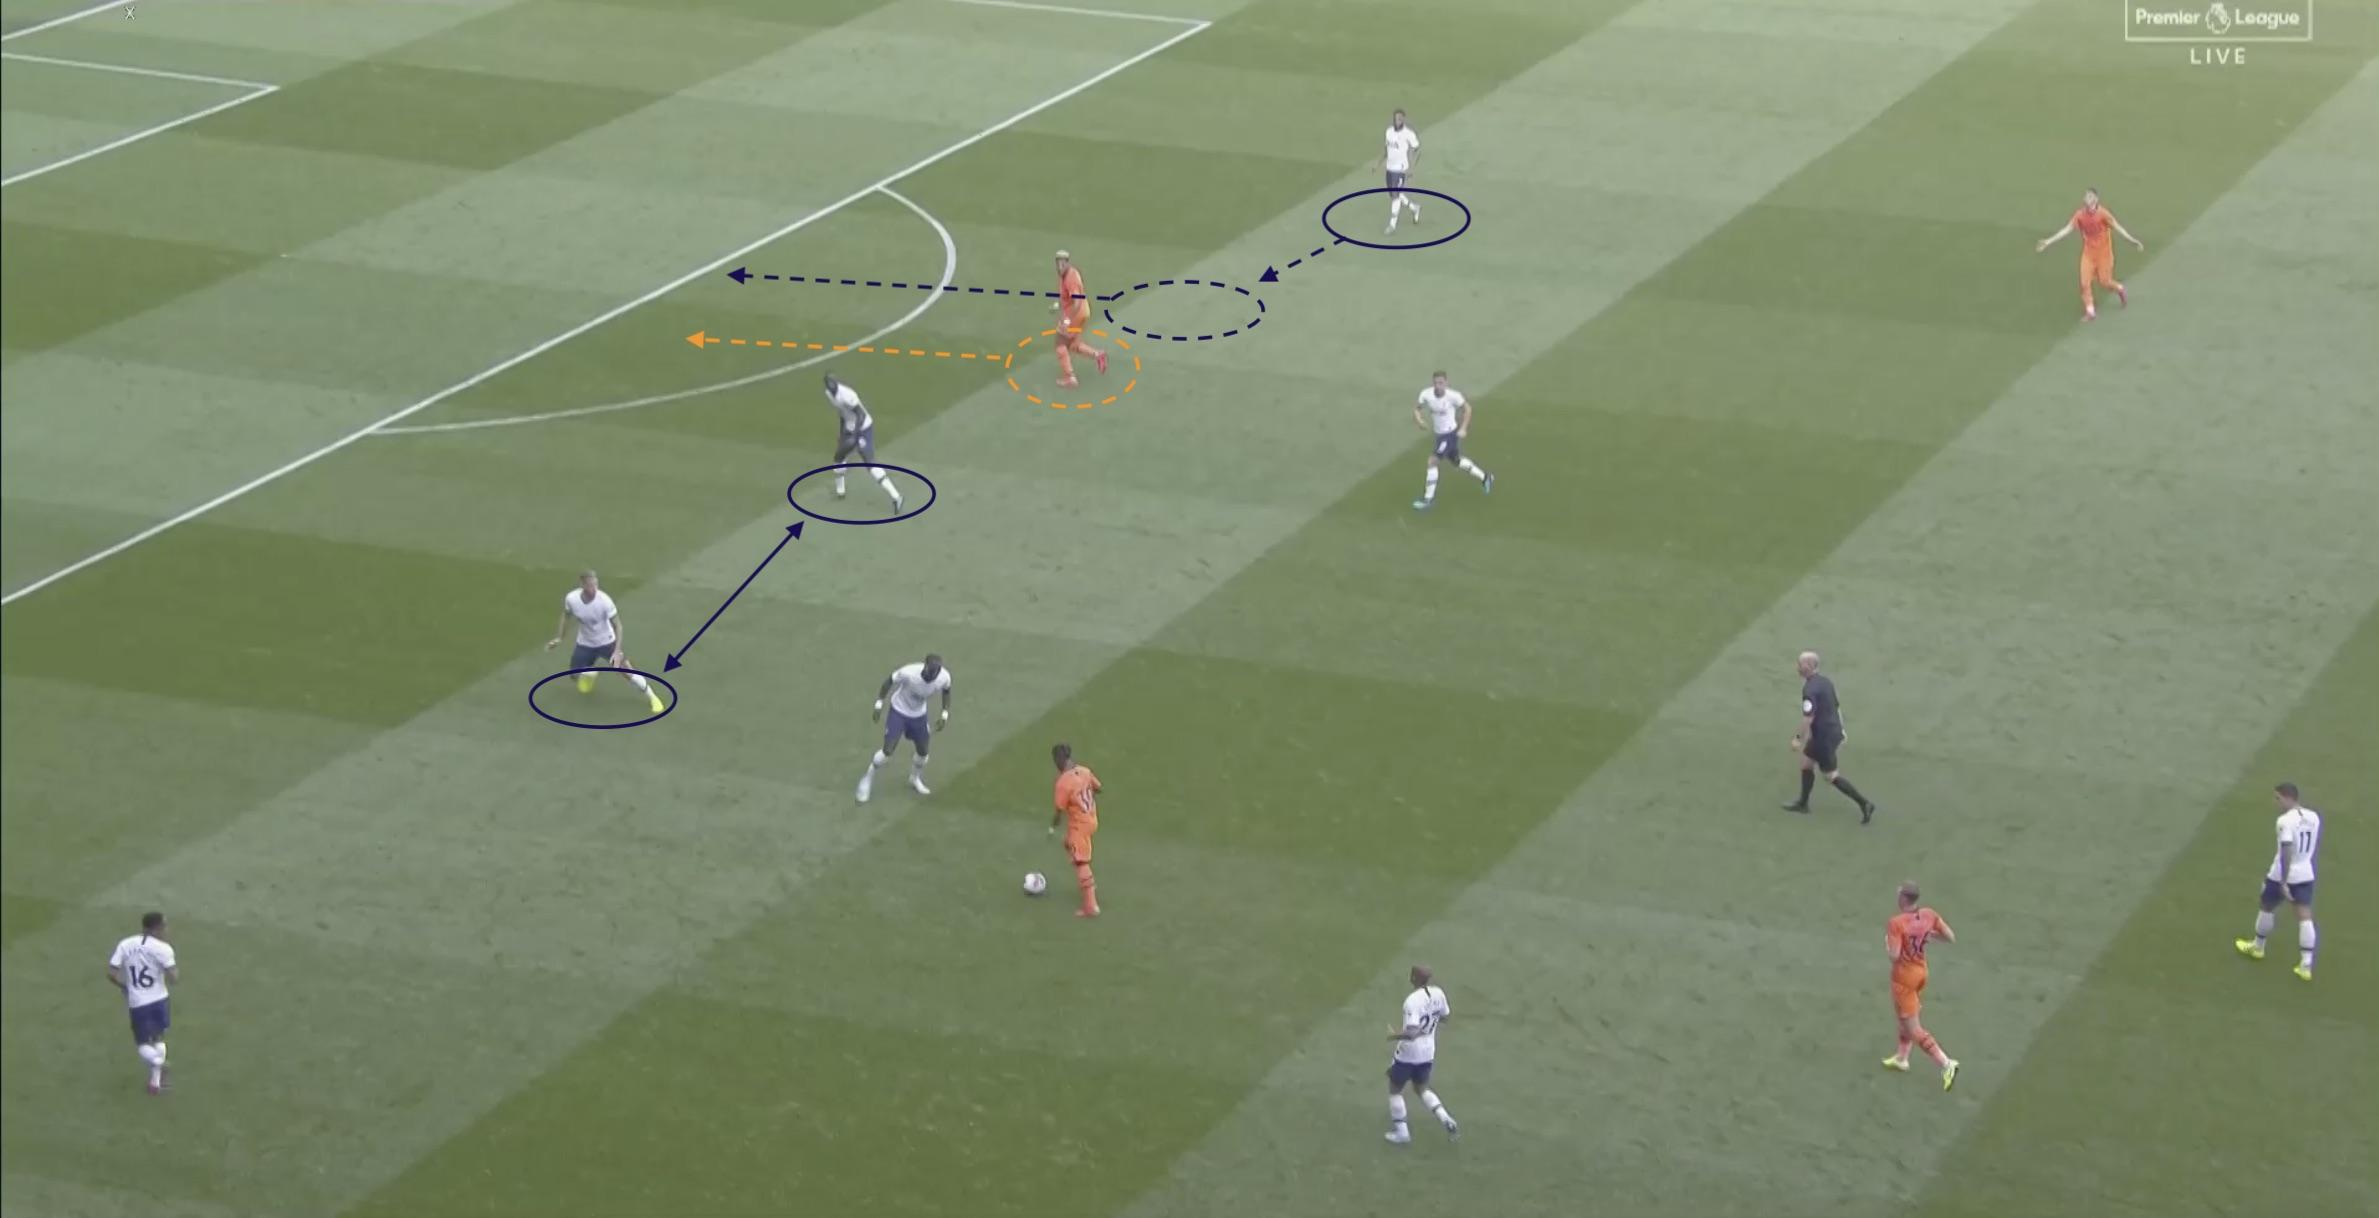 Premier League 2019/20: Tottenham vs Newcastle - tactical analysis tactics